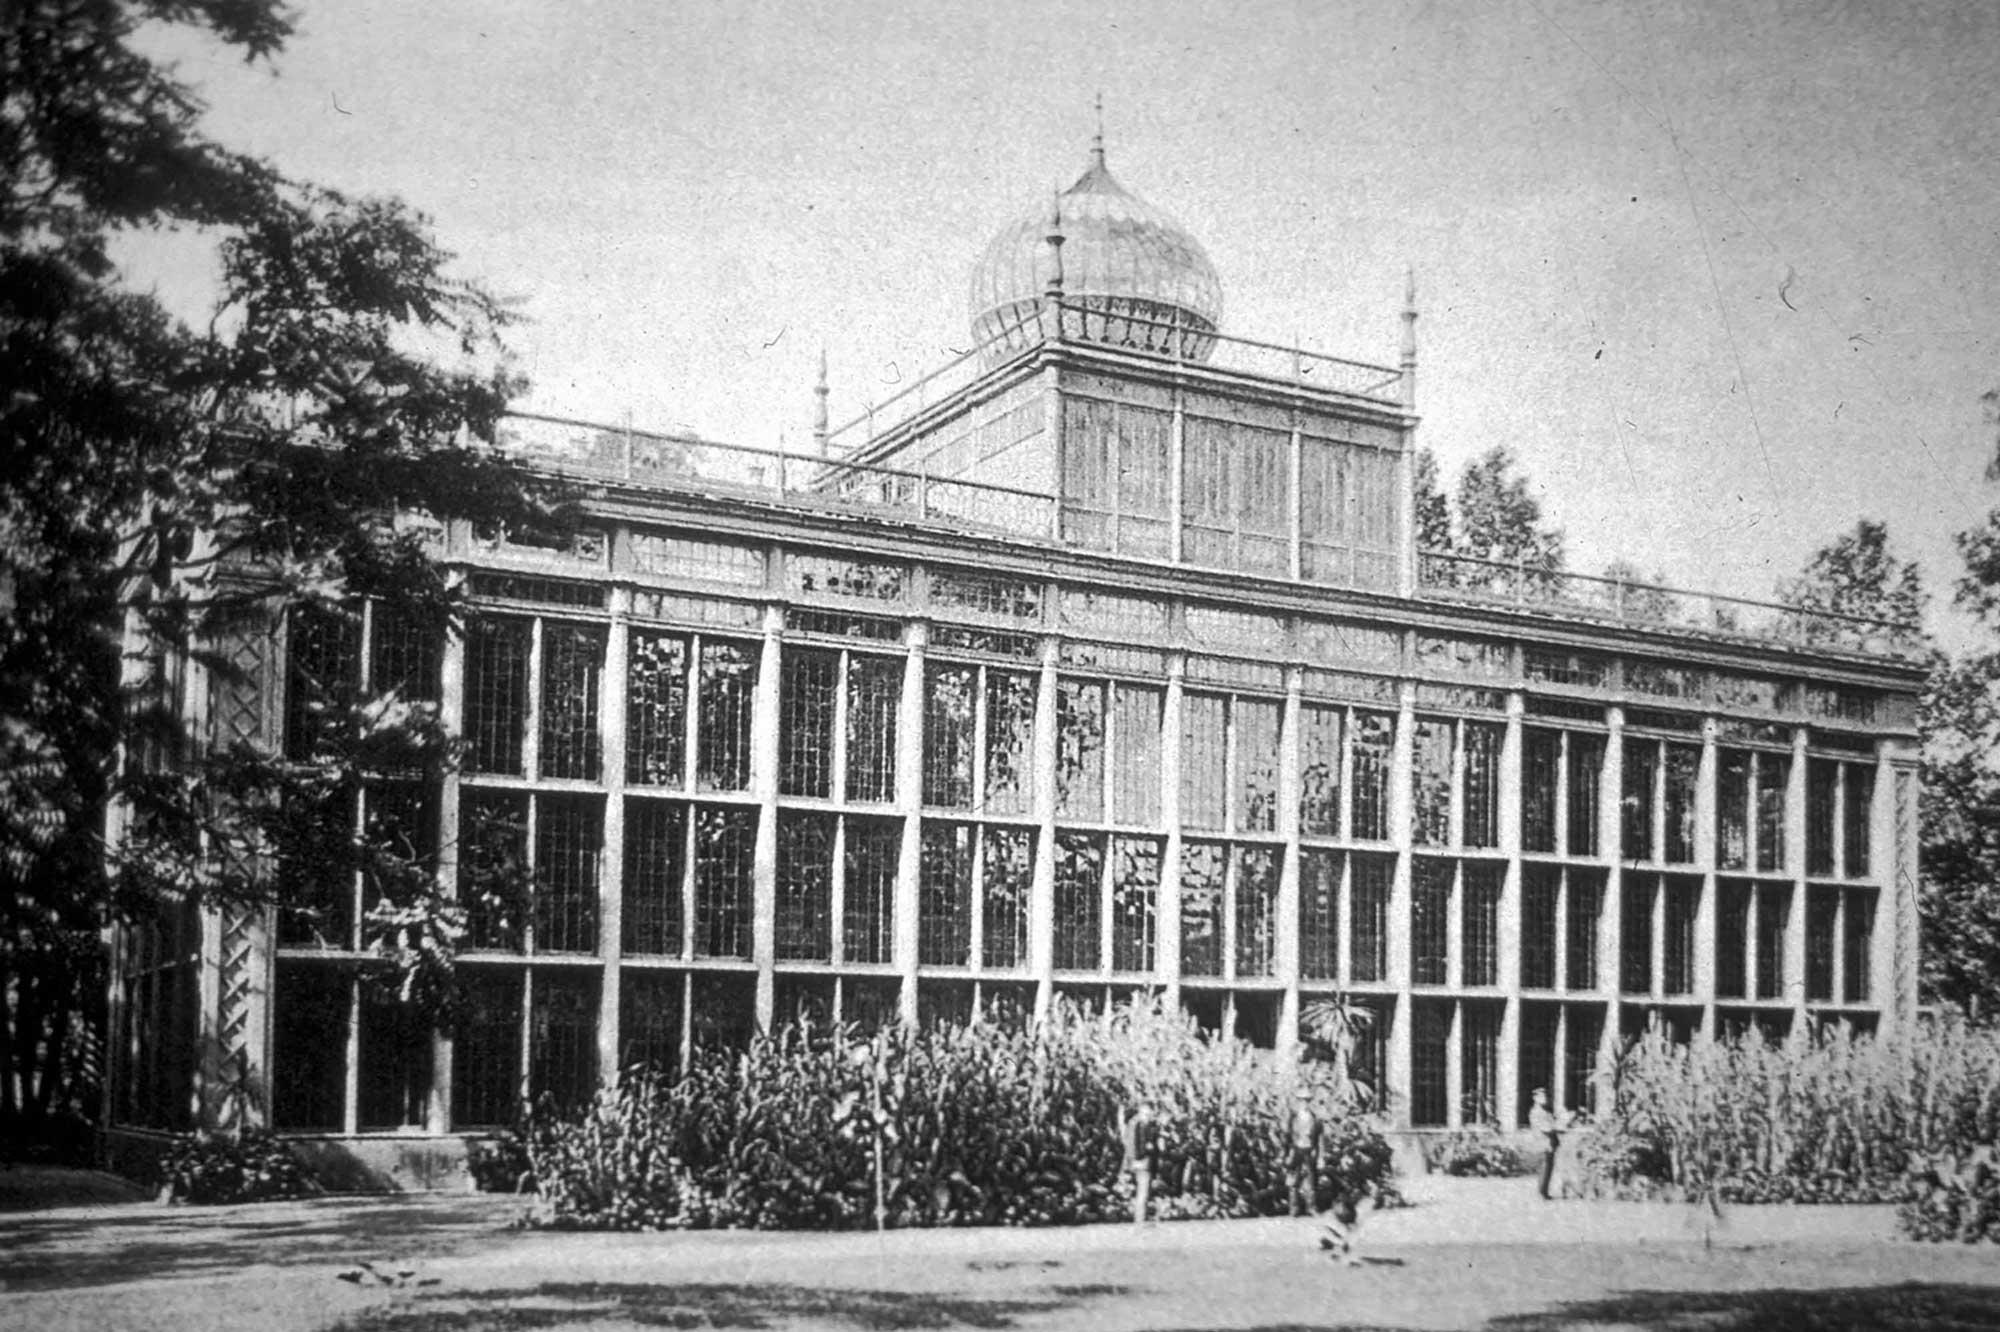 Historische Fotografie des Palmenhauses